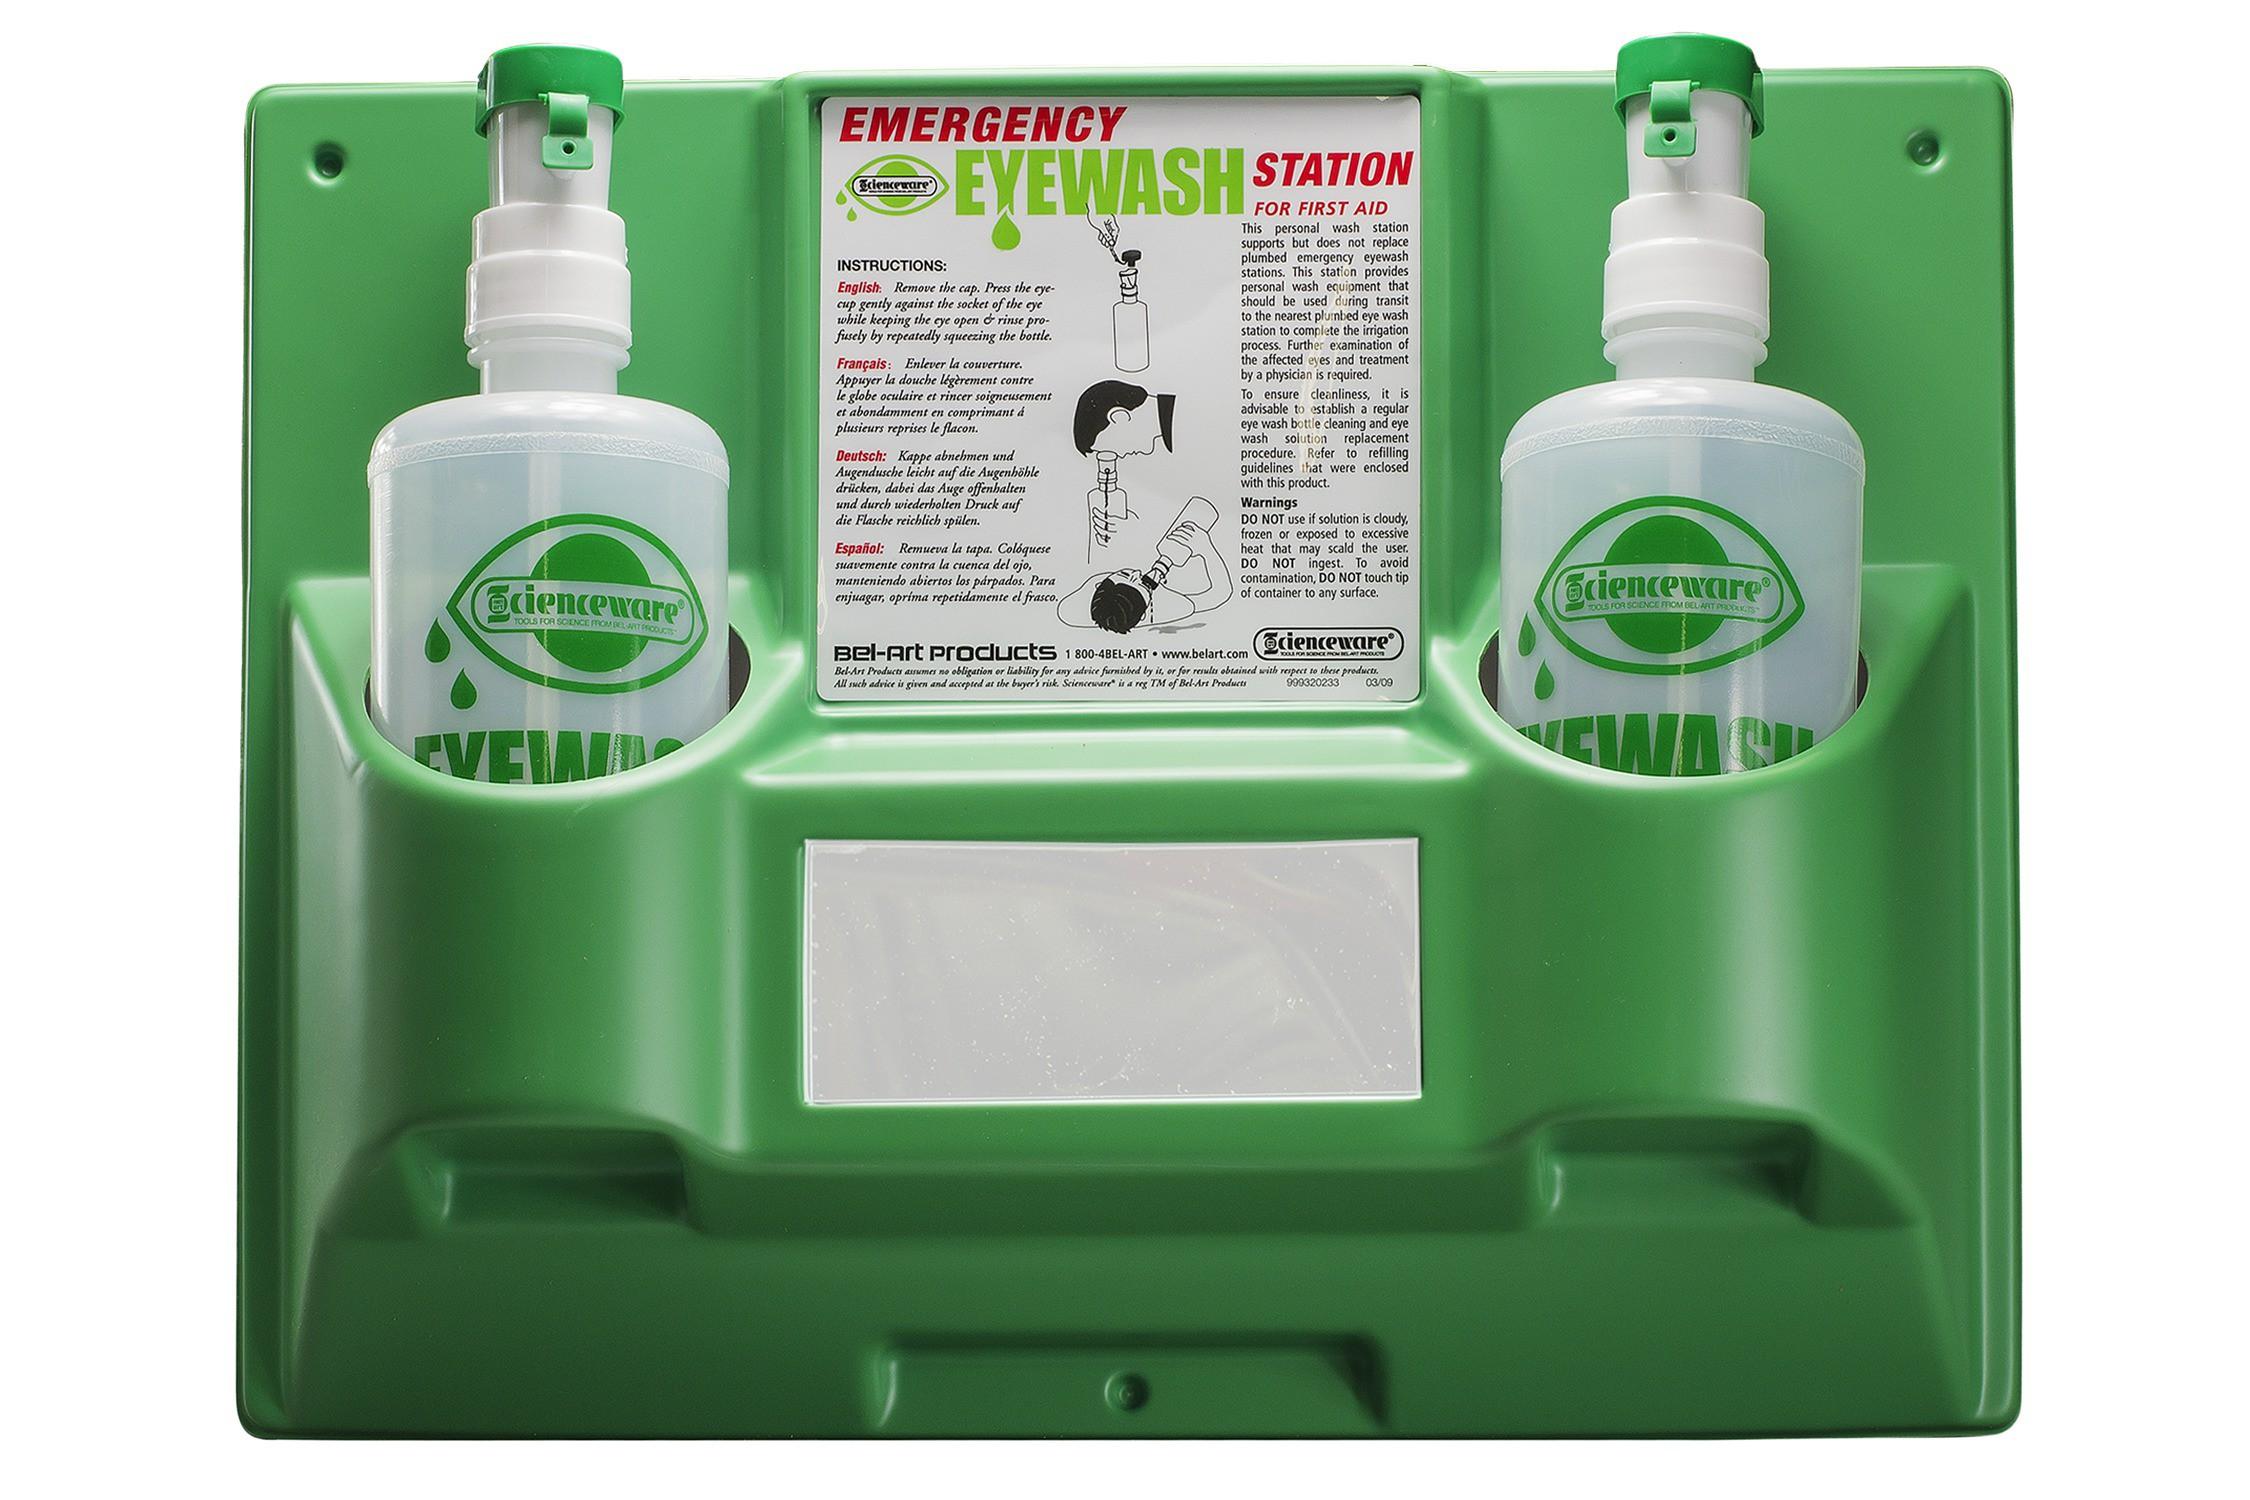 BEL-ART EMERGENCY EYE WASH SAFETY STATIONS 2 BOTTLE